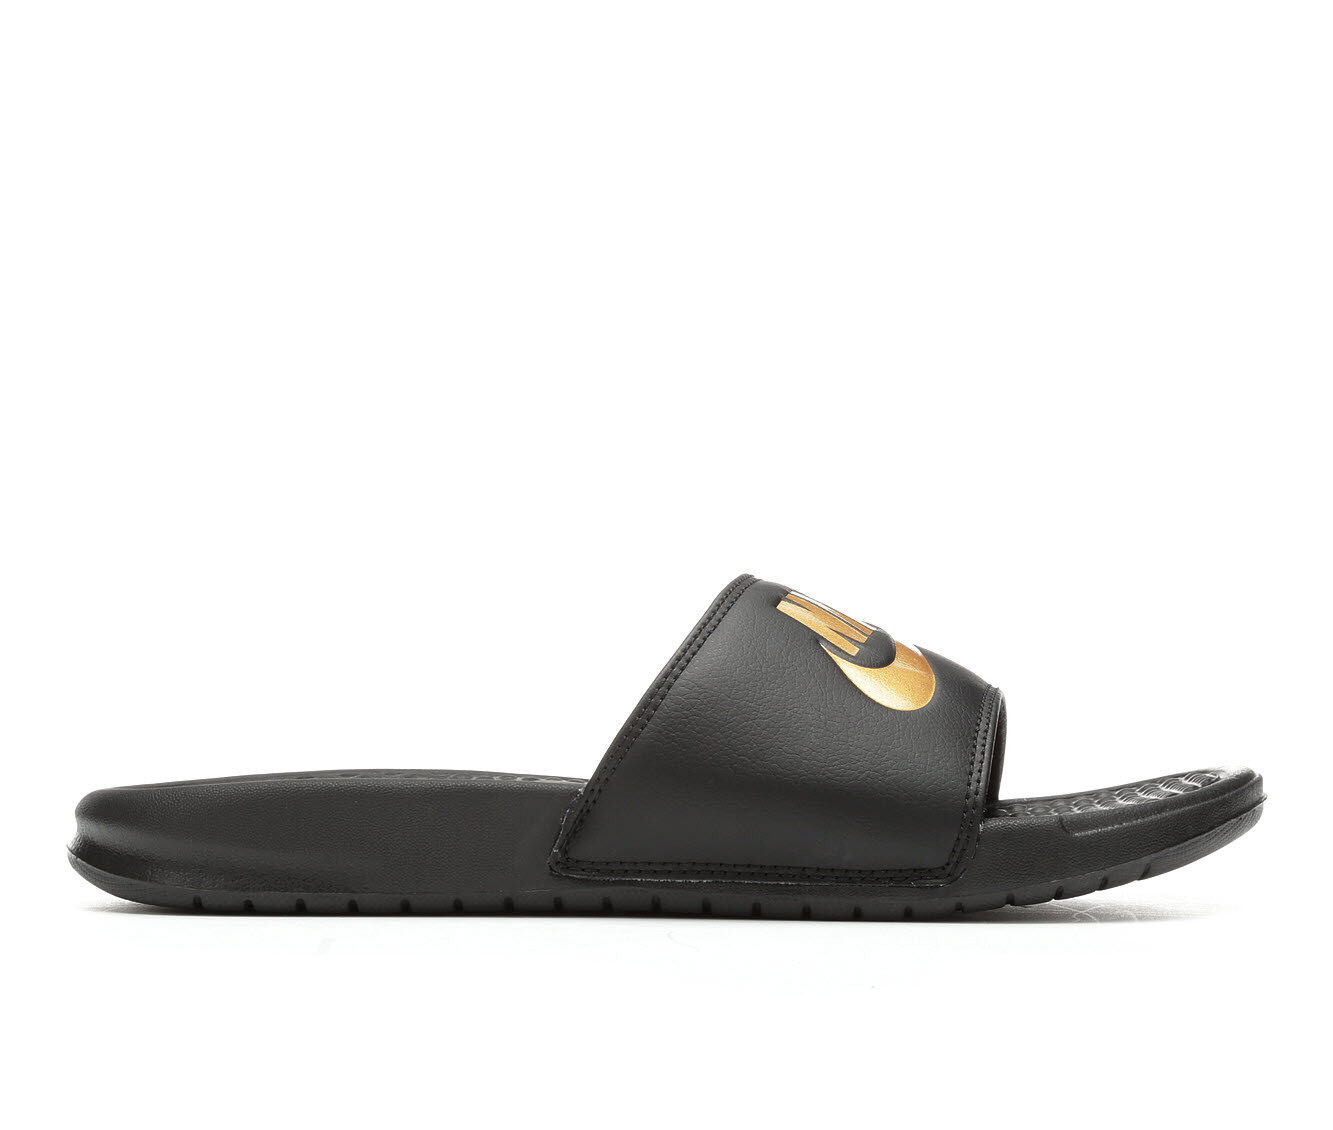 Men's Nike Benassi JDI Sport Slides Black/Met Gold